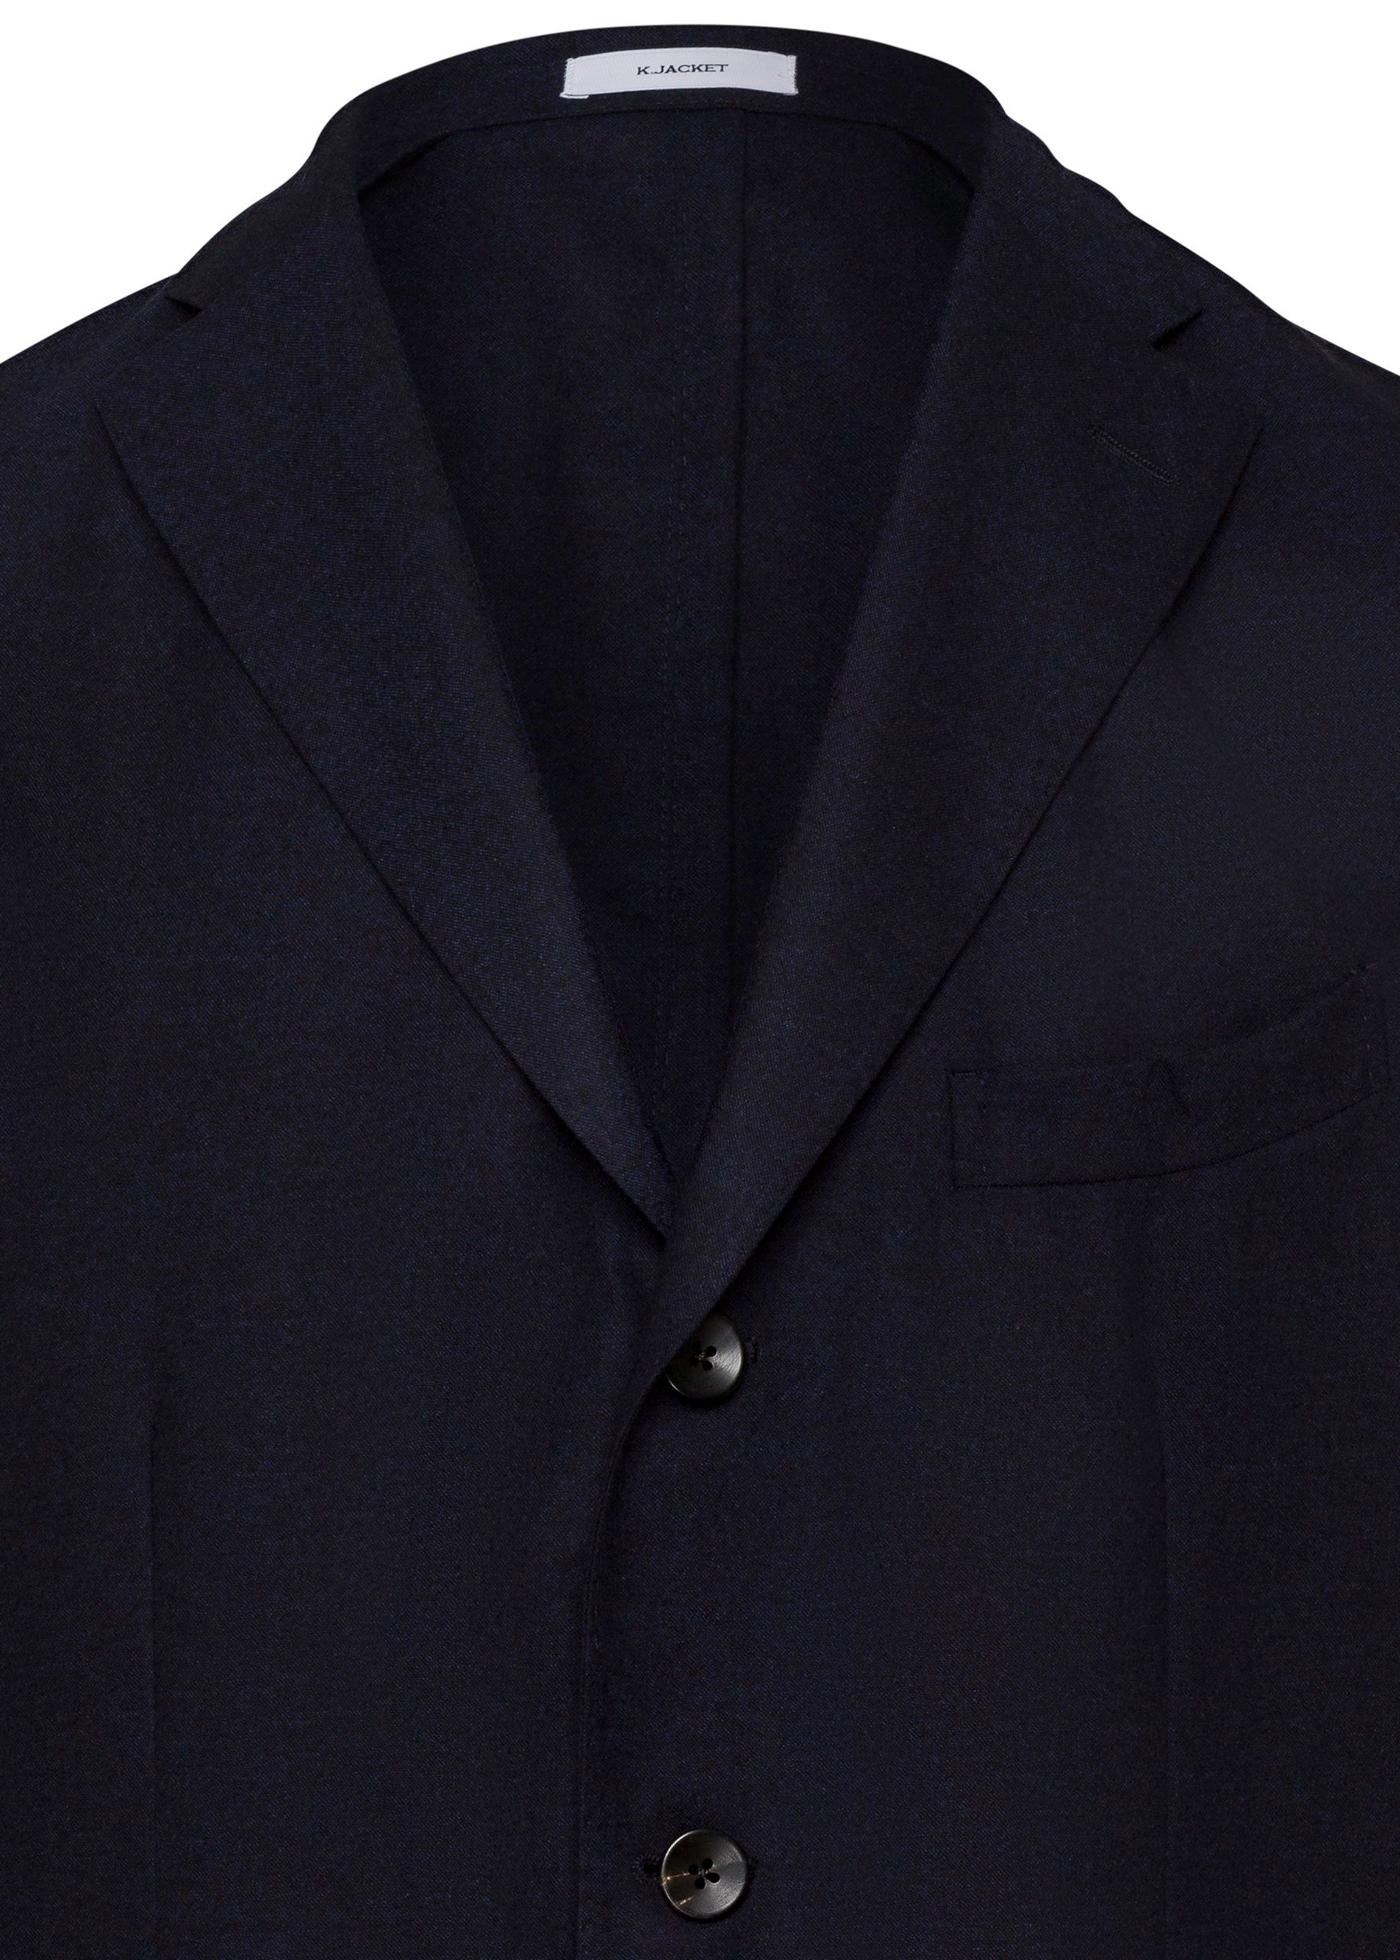 Fine Wool Blazer image number 2